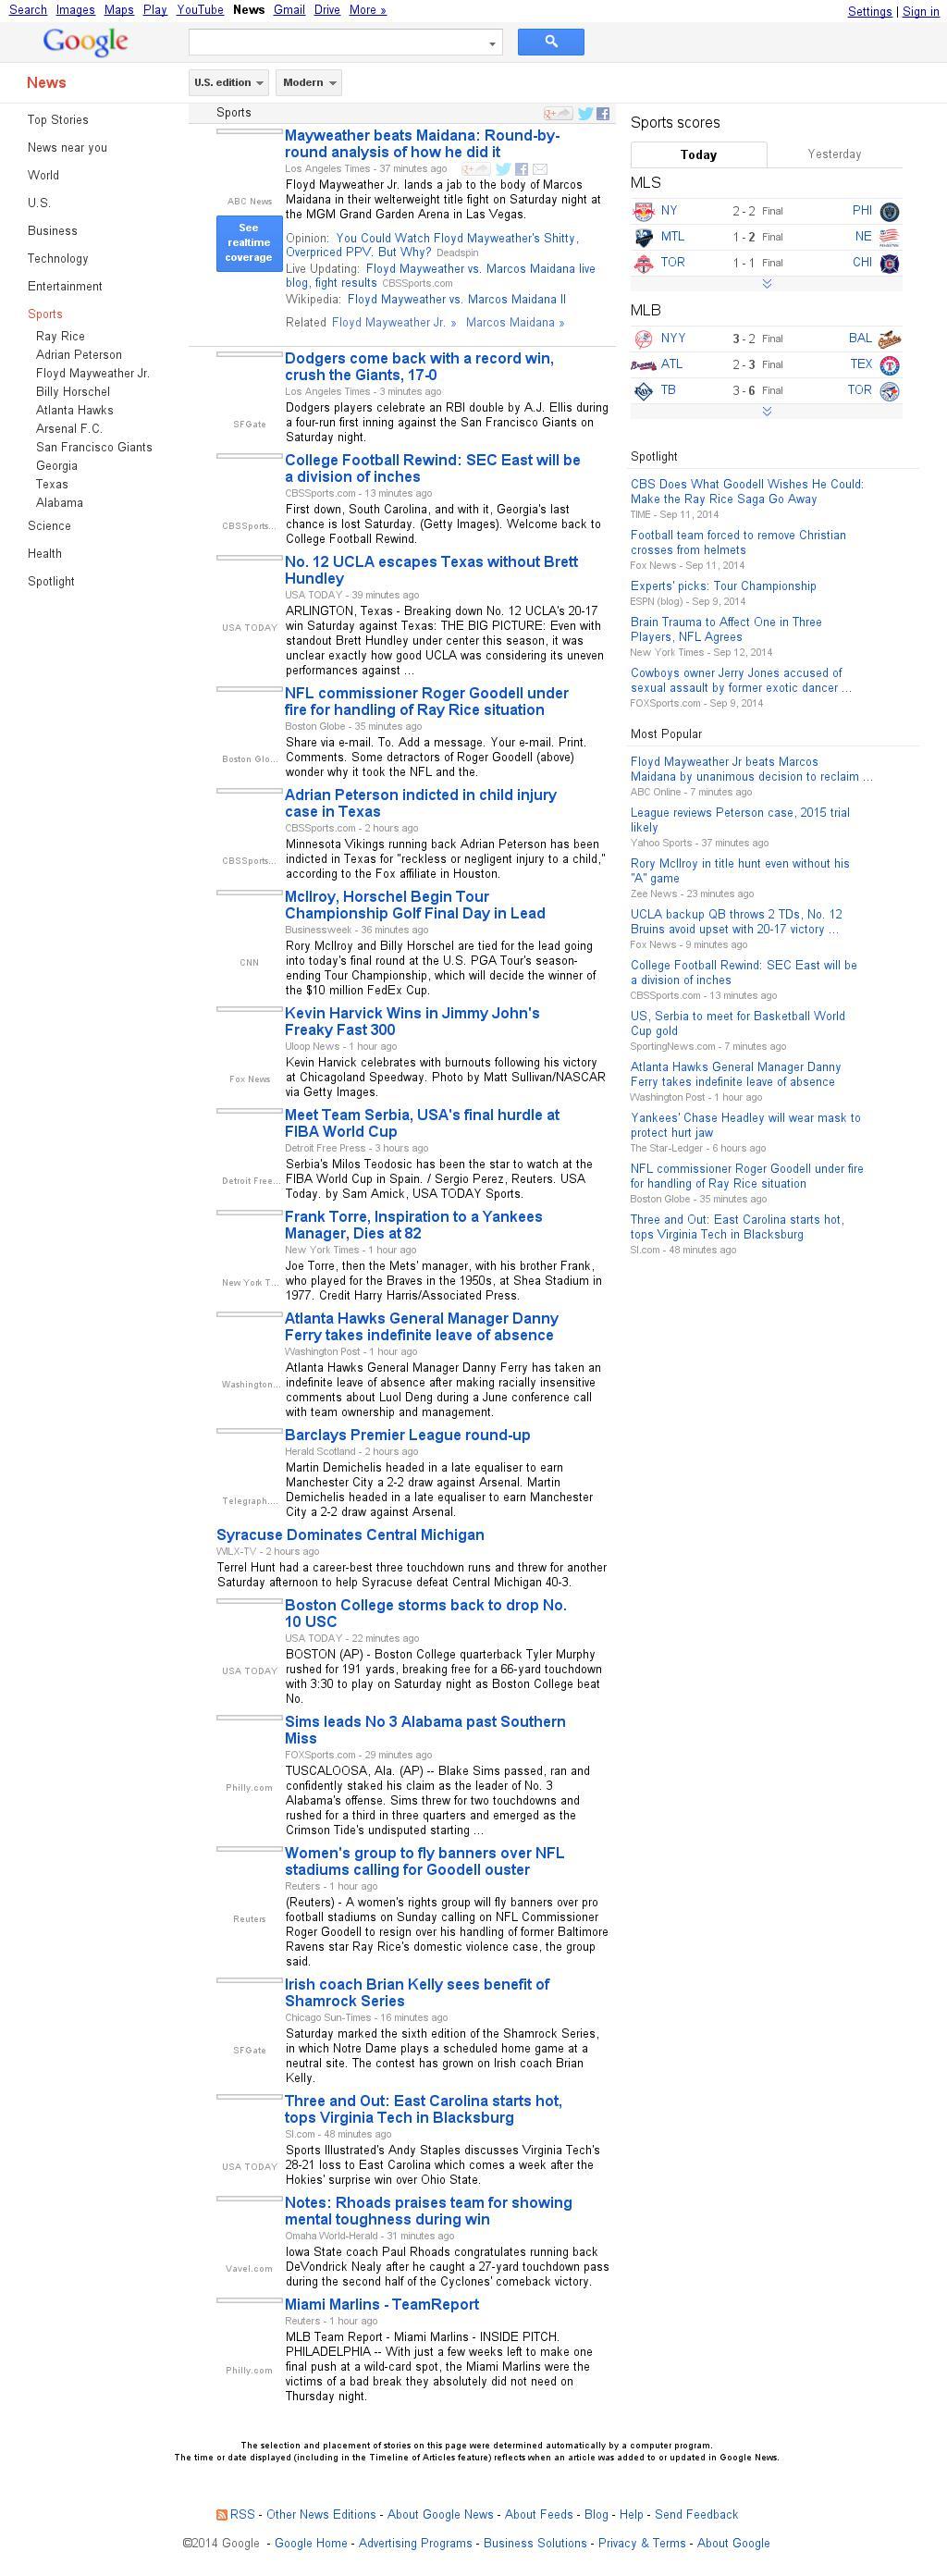 Google News: Sports at Sunday Sept. 14, 2014, 5:07 a.m. UTC